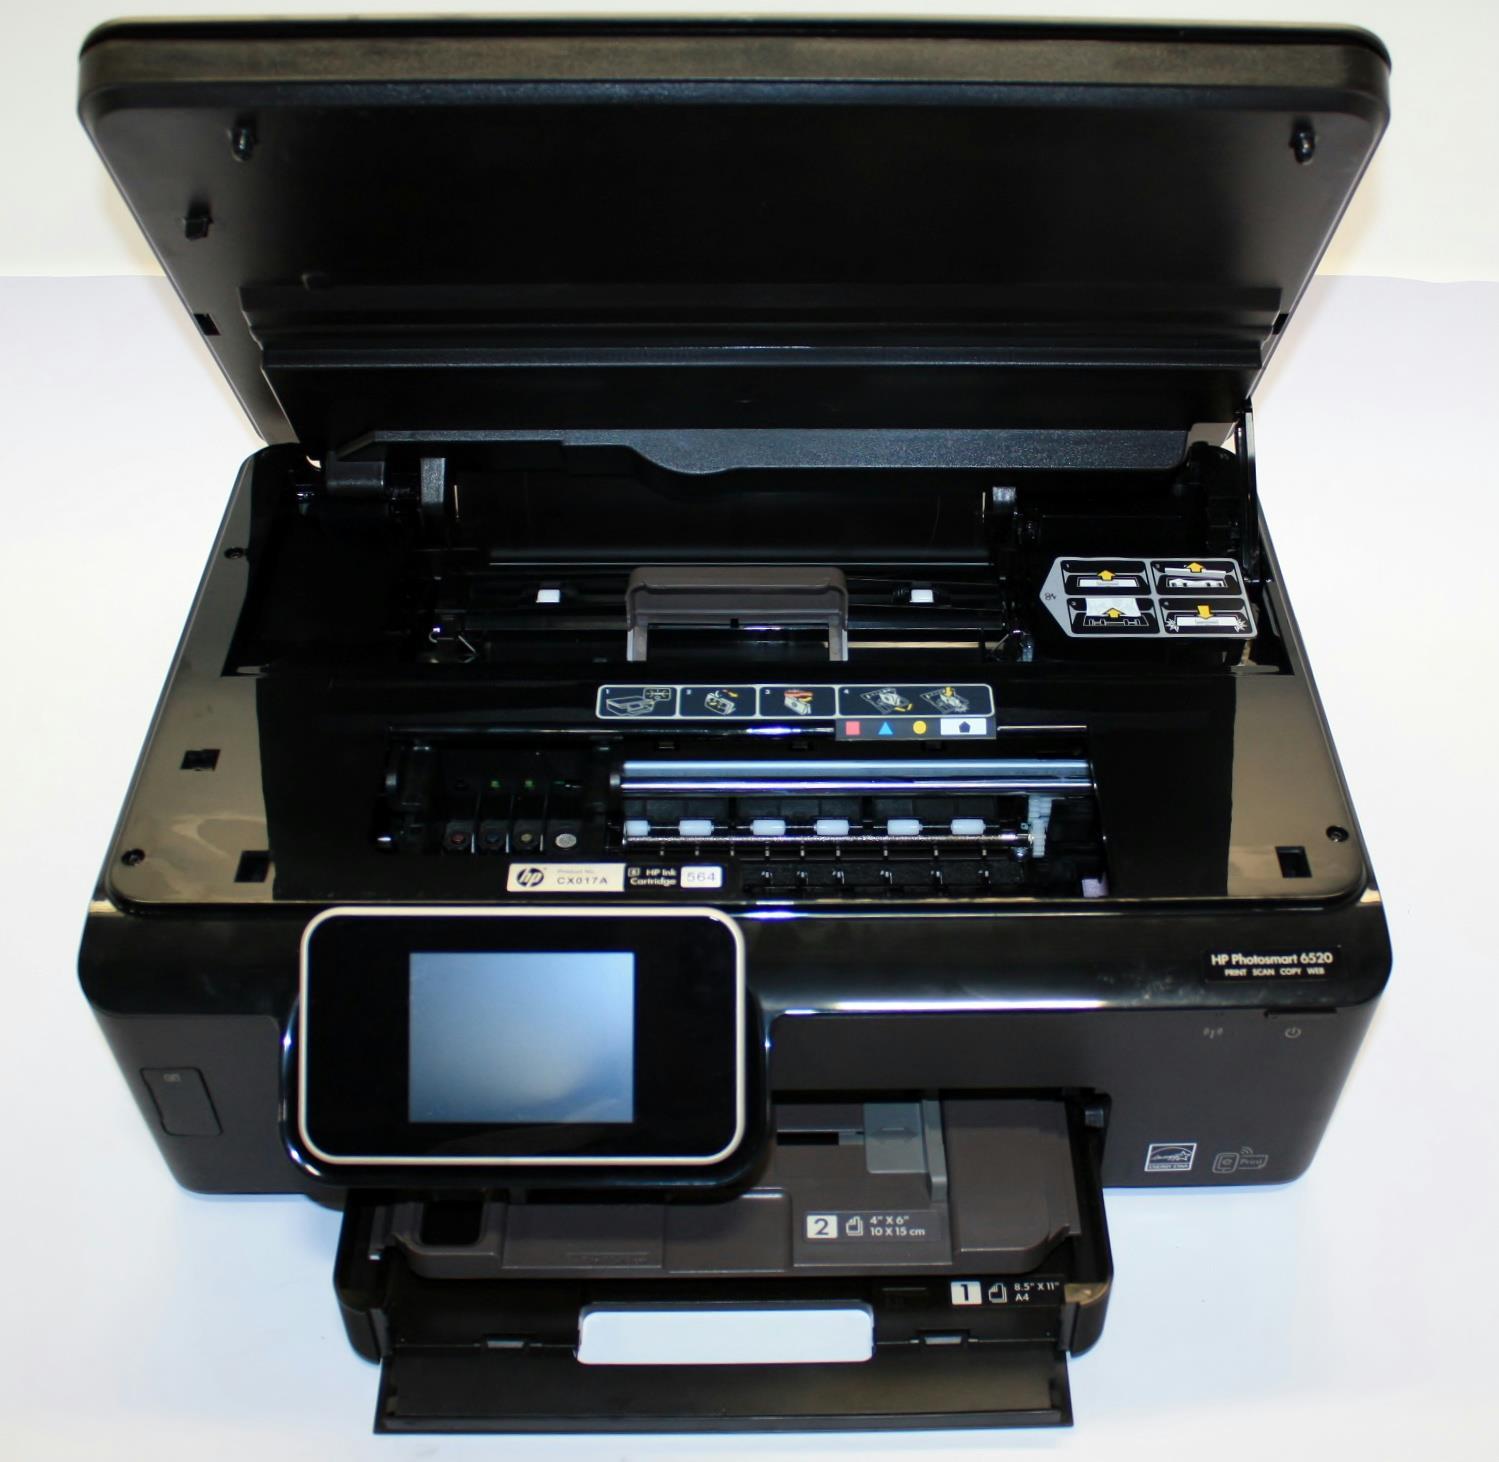 HP Photosmart 6520 *For Parts* Wireless AIO Inkjet Printer CX017A#B1H  800124054